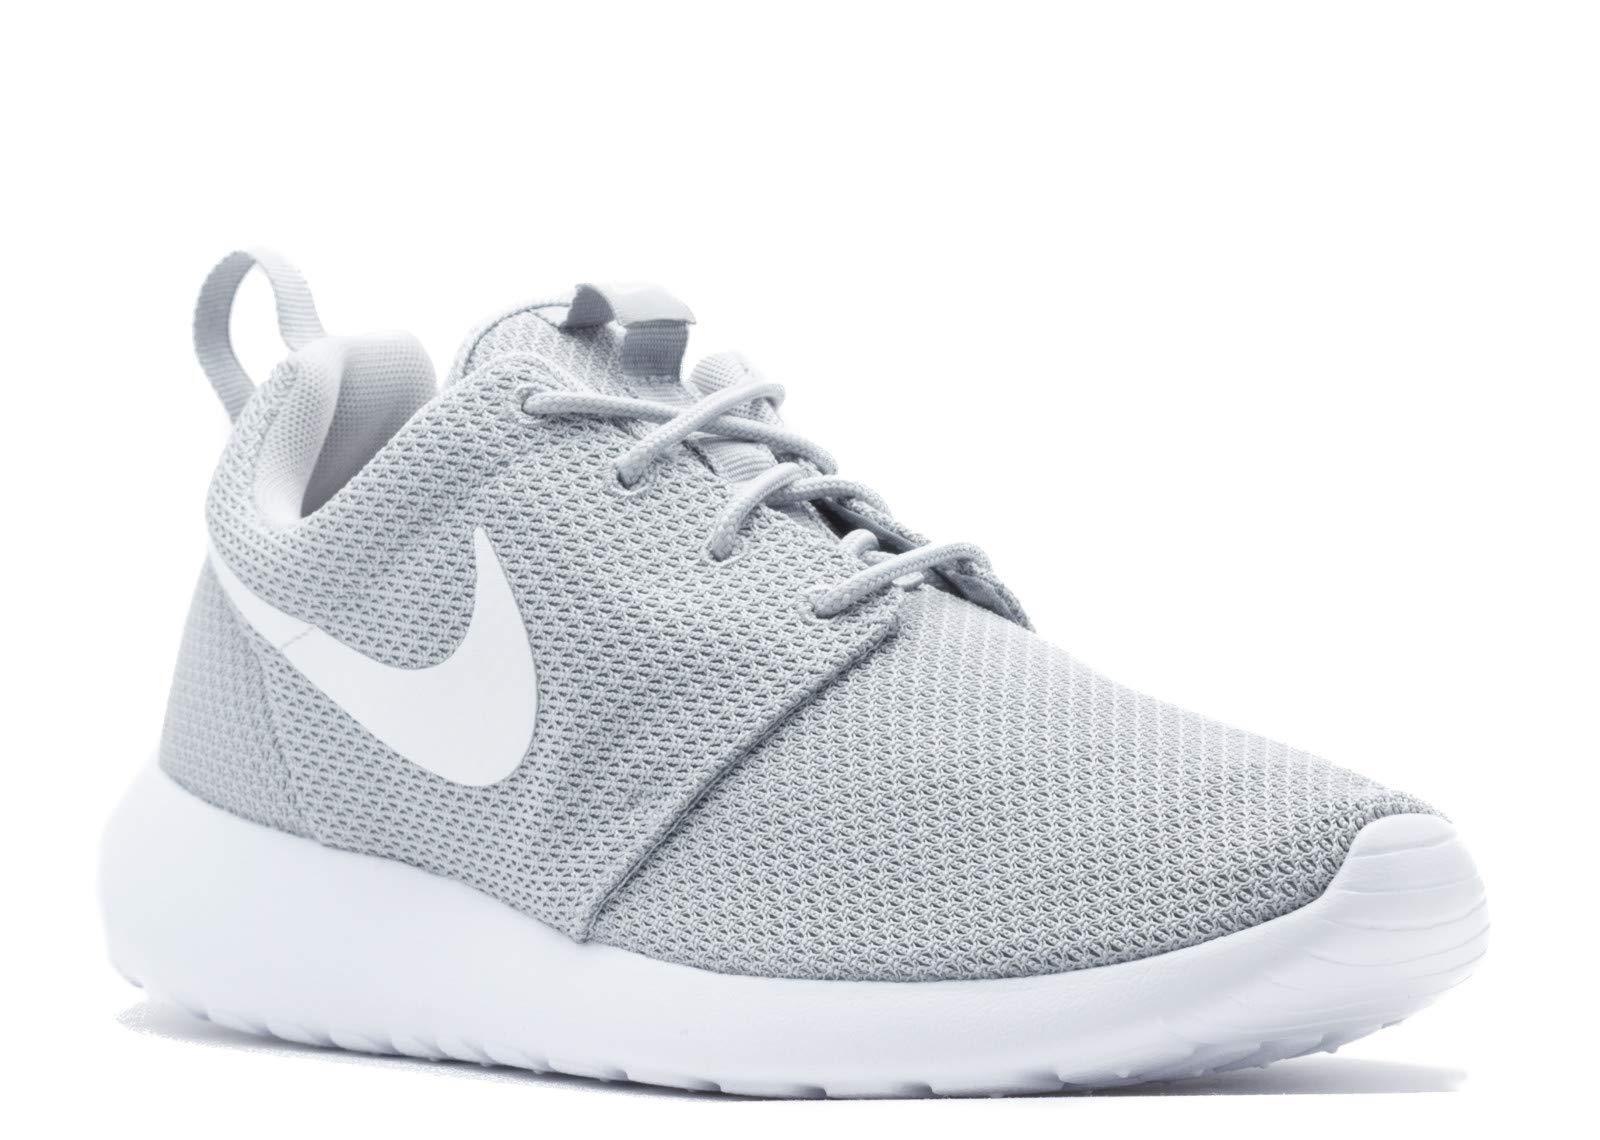 bb308b218d9c Galleon - Seednoma Nike Roshe Run One Men s Shoes 511881-023(Gray ...